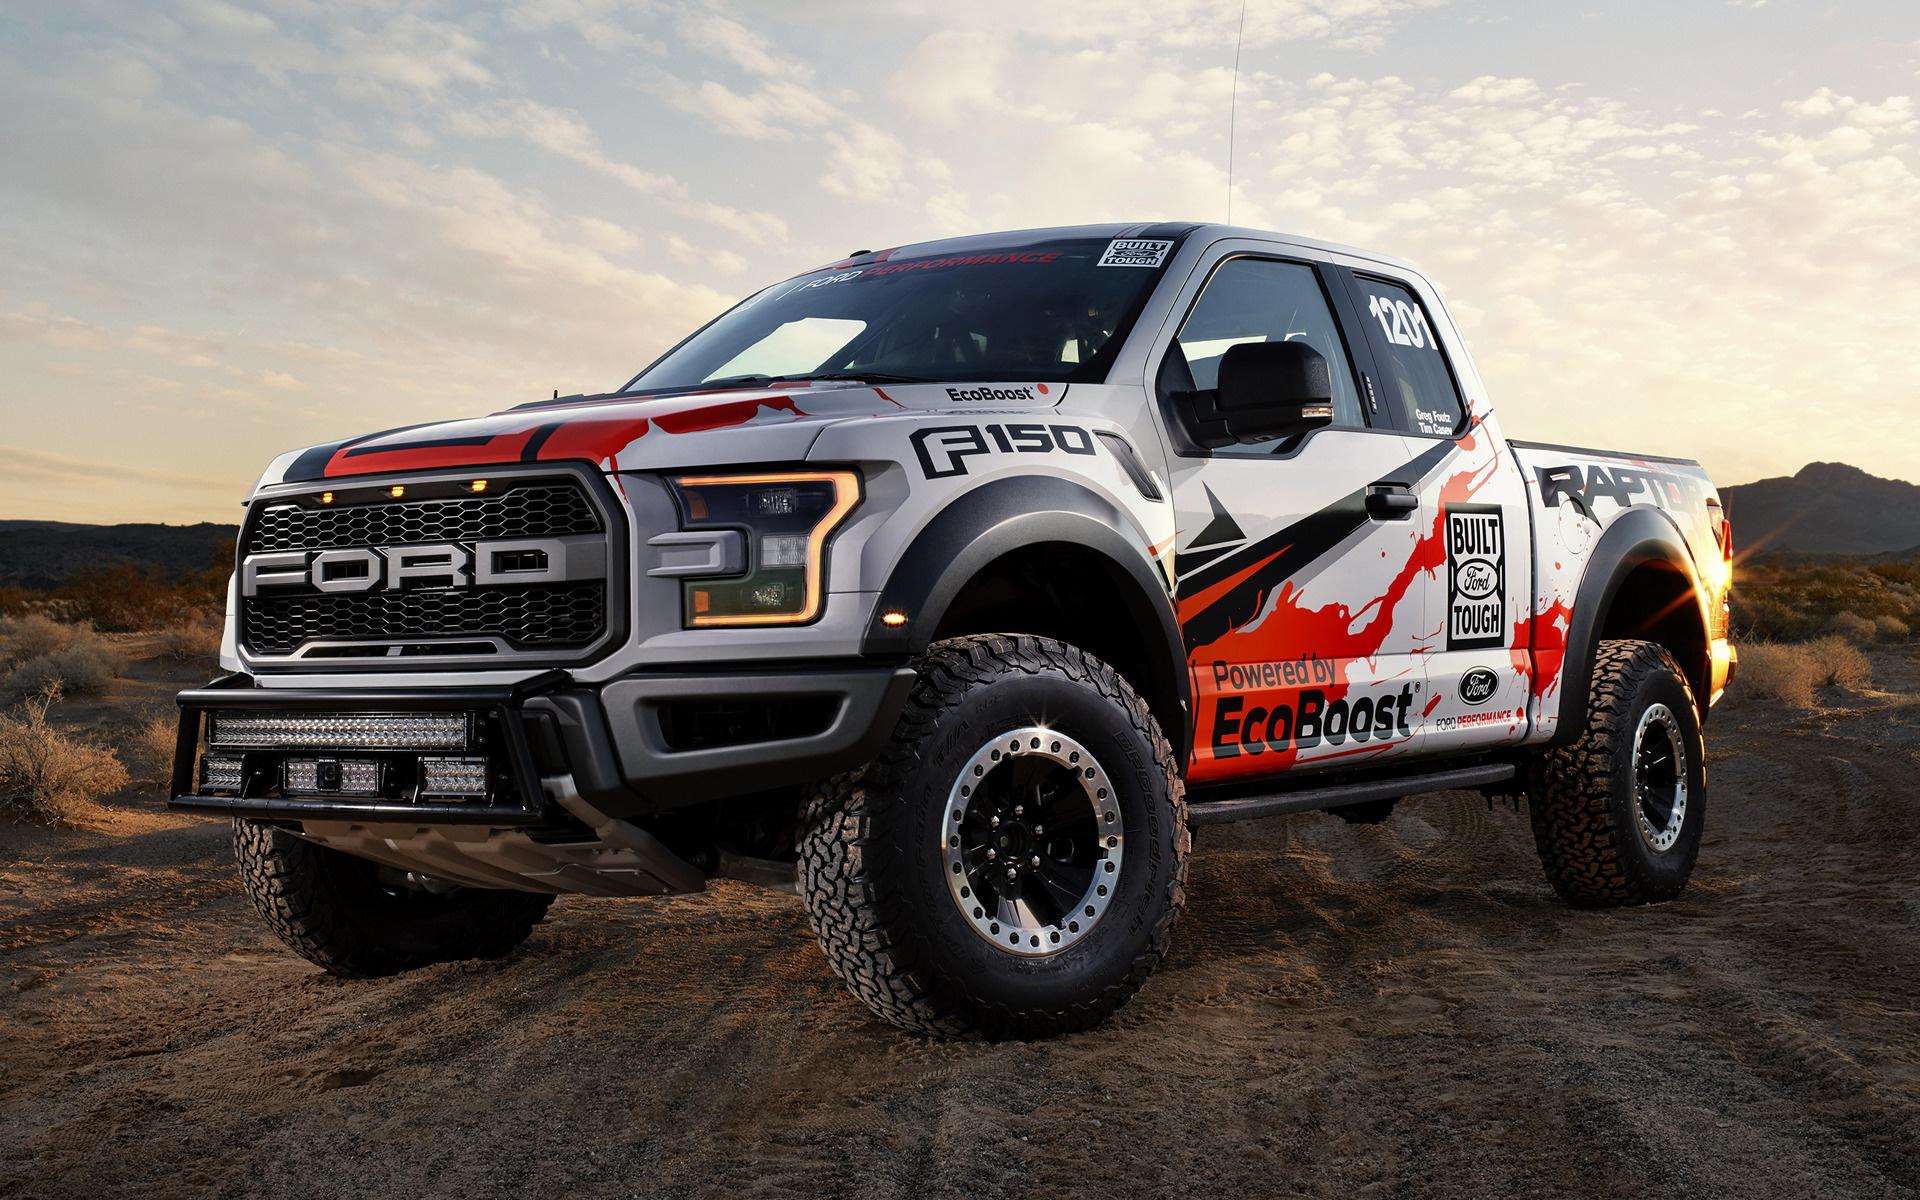 raptor ford 150 truck race racing road f150 desert velociraptor ws wallpapers hd wide versus winner compete rapter